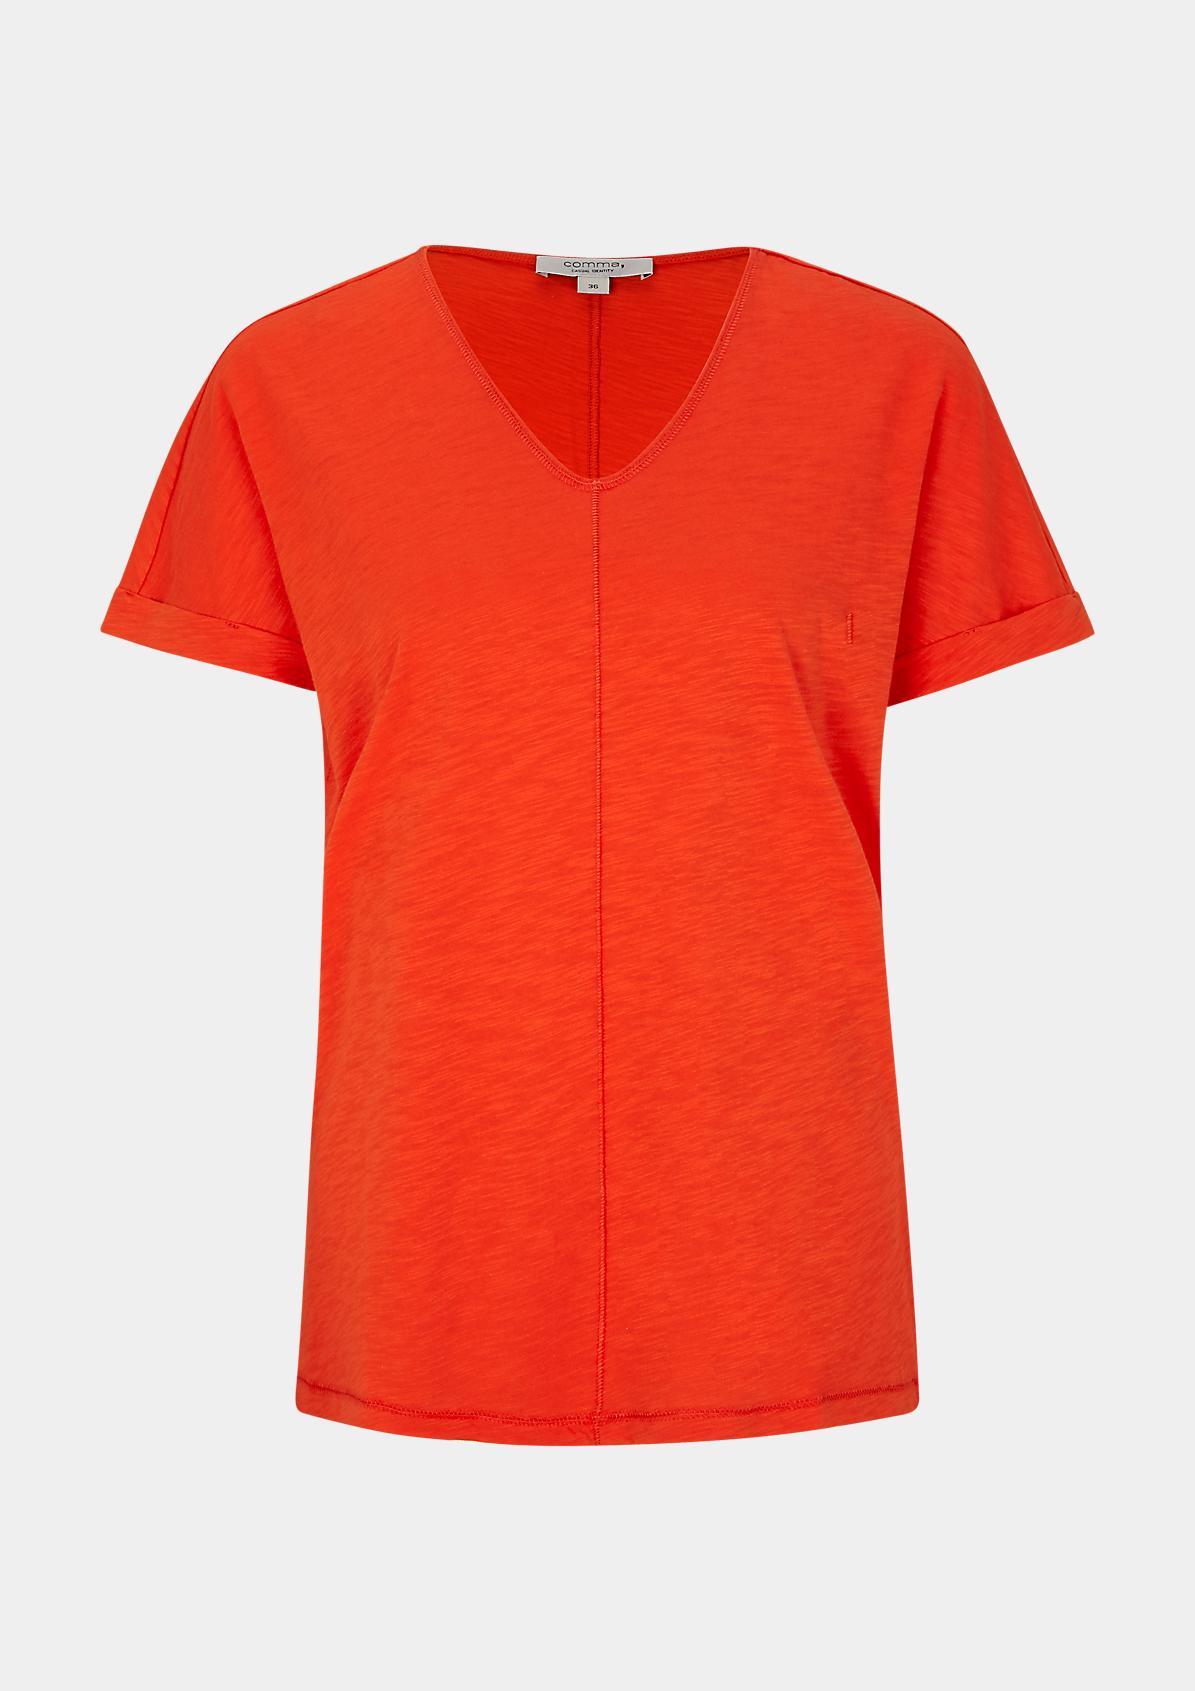 comma Slub yarn top with a V-neckline logo